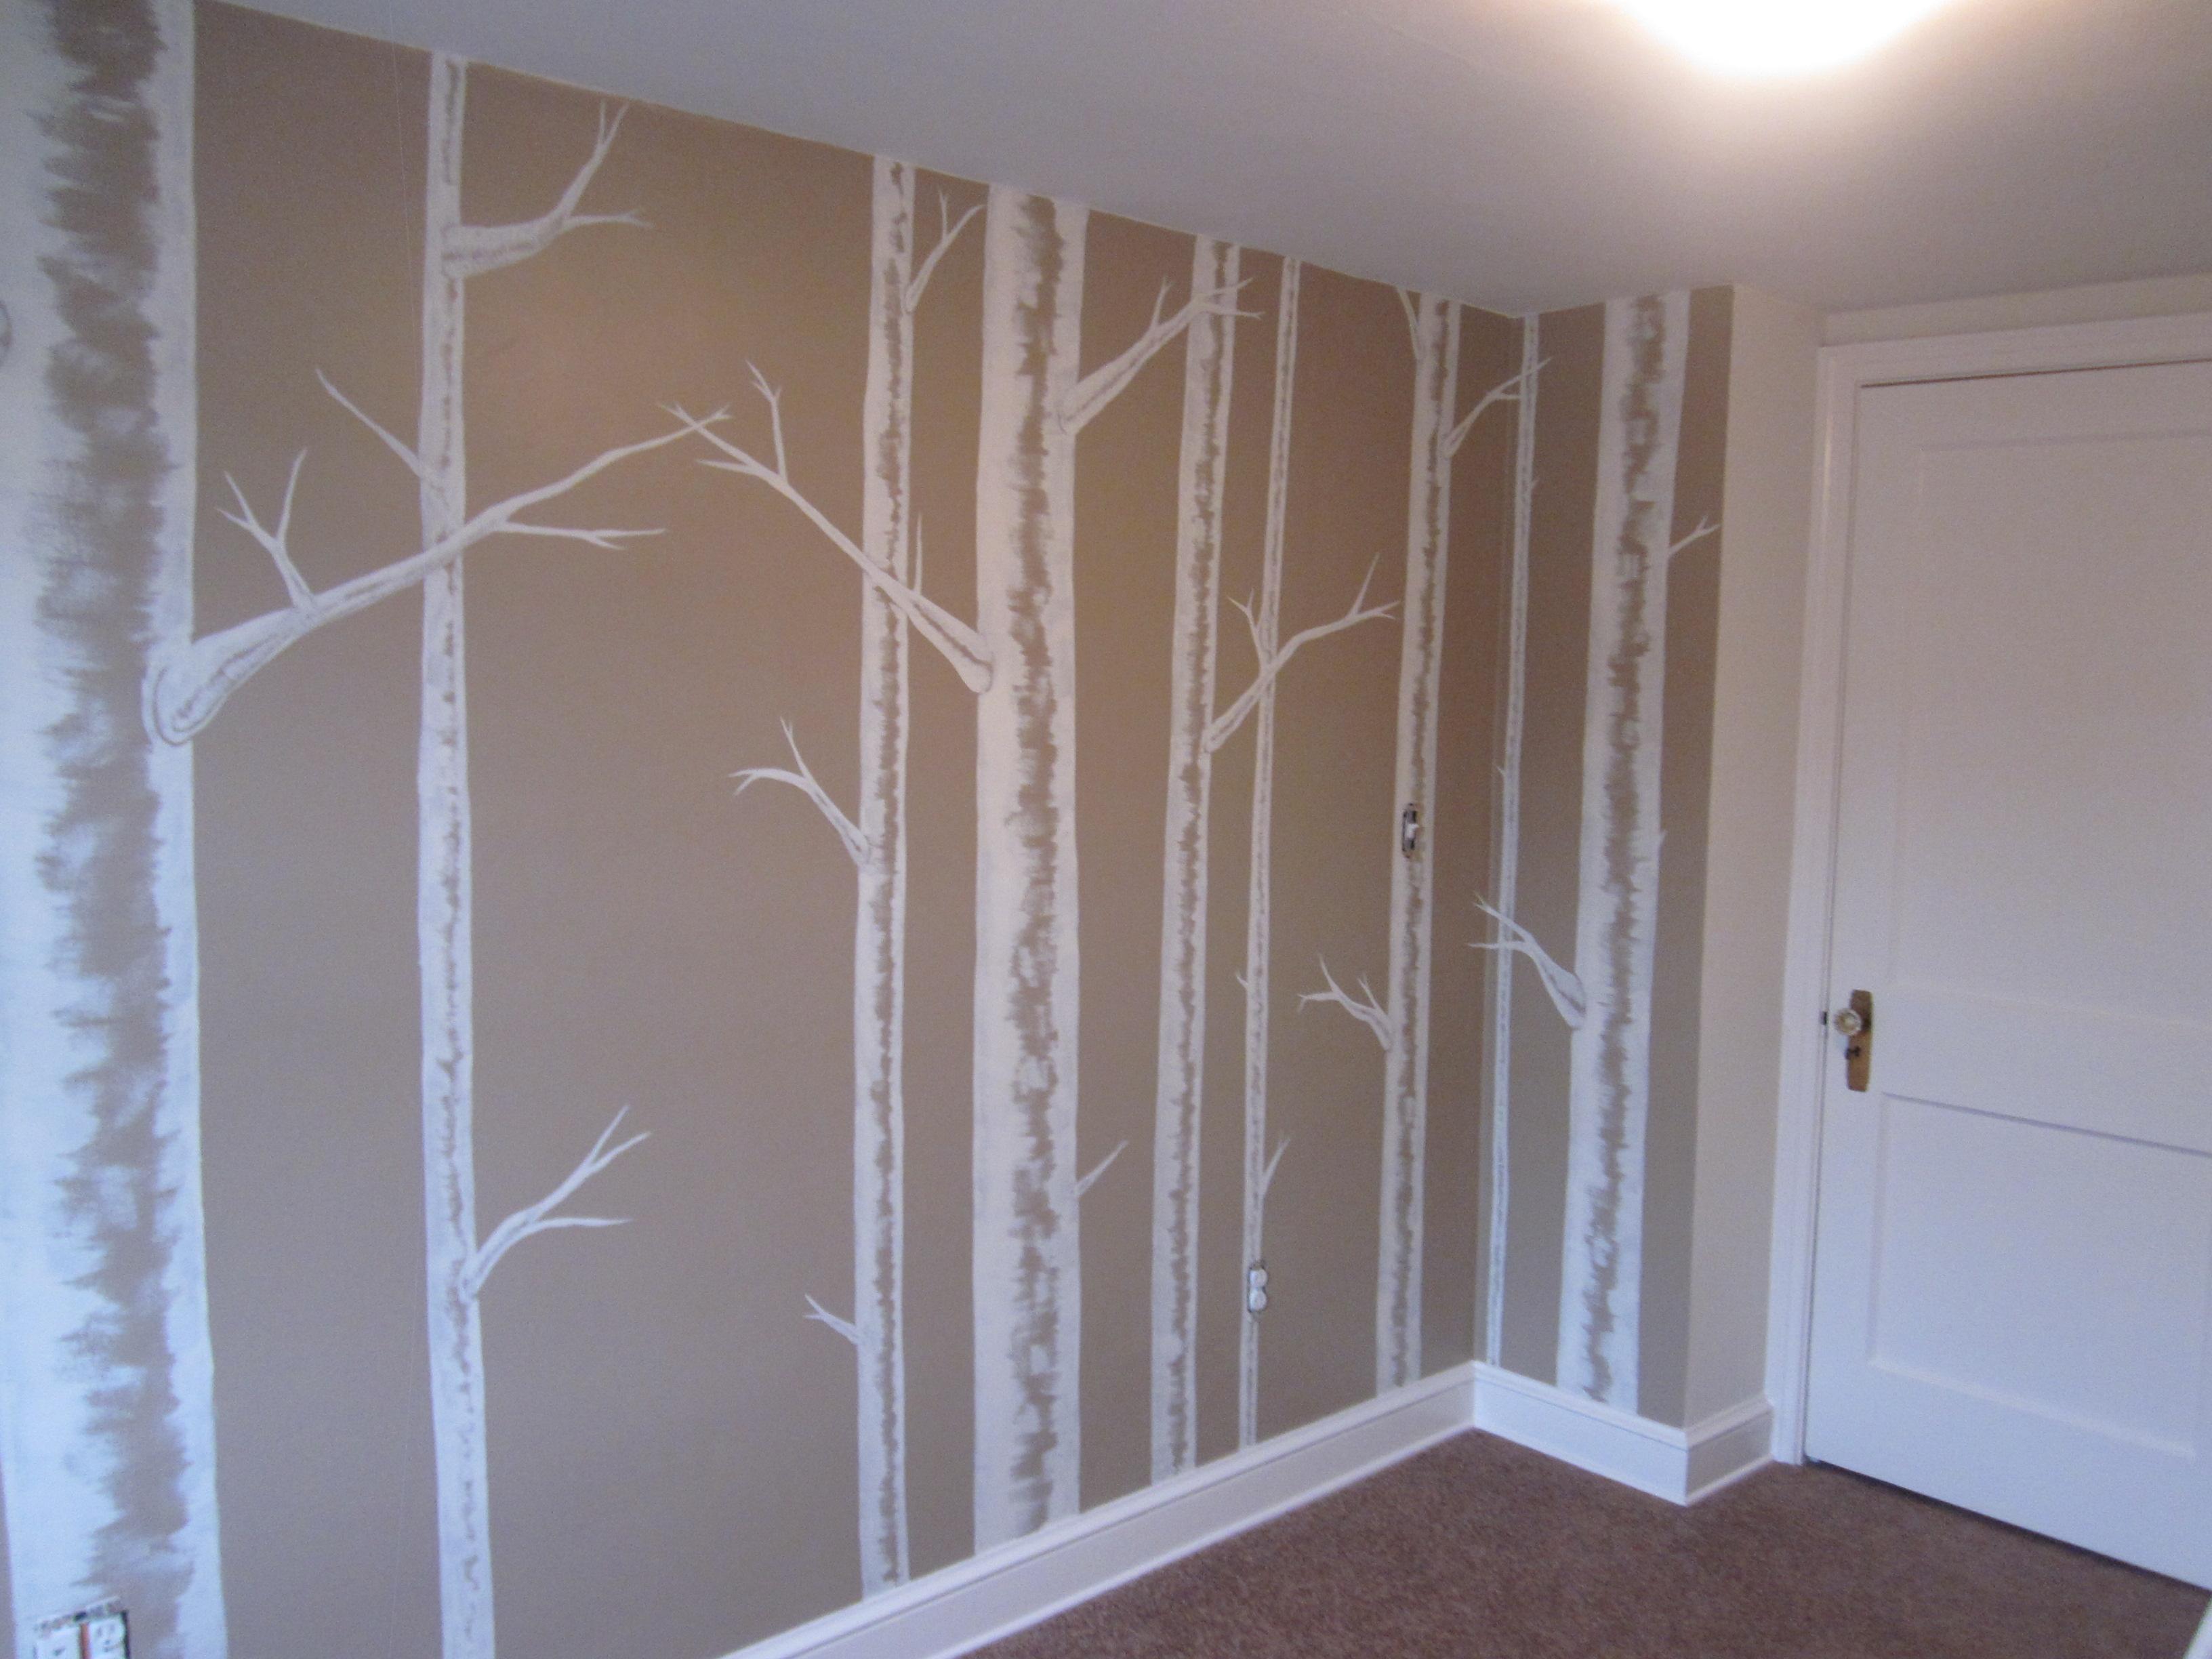 Free download sherwin williams wallpaper murals [3264x2448 ...